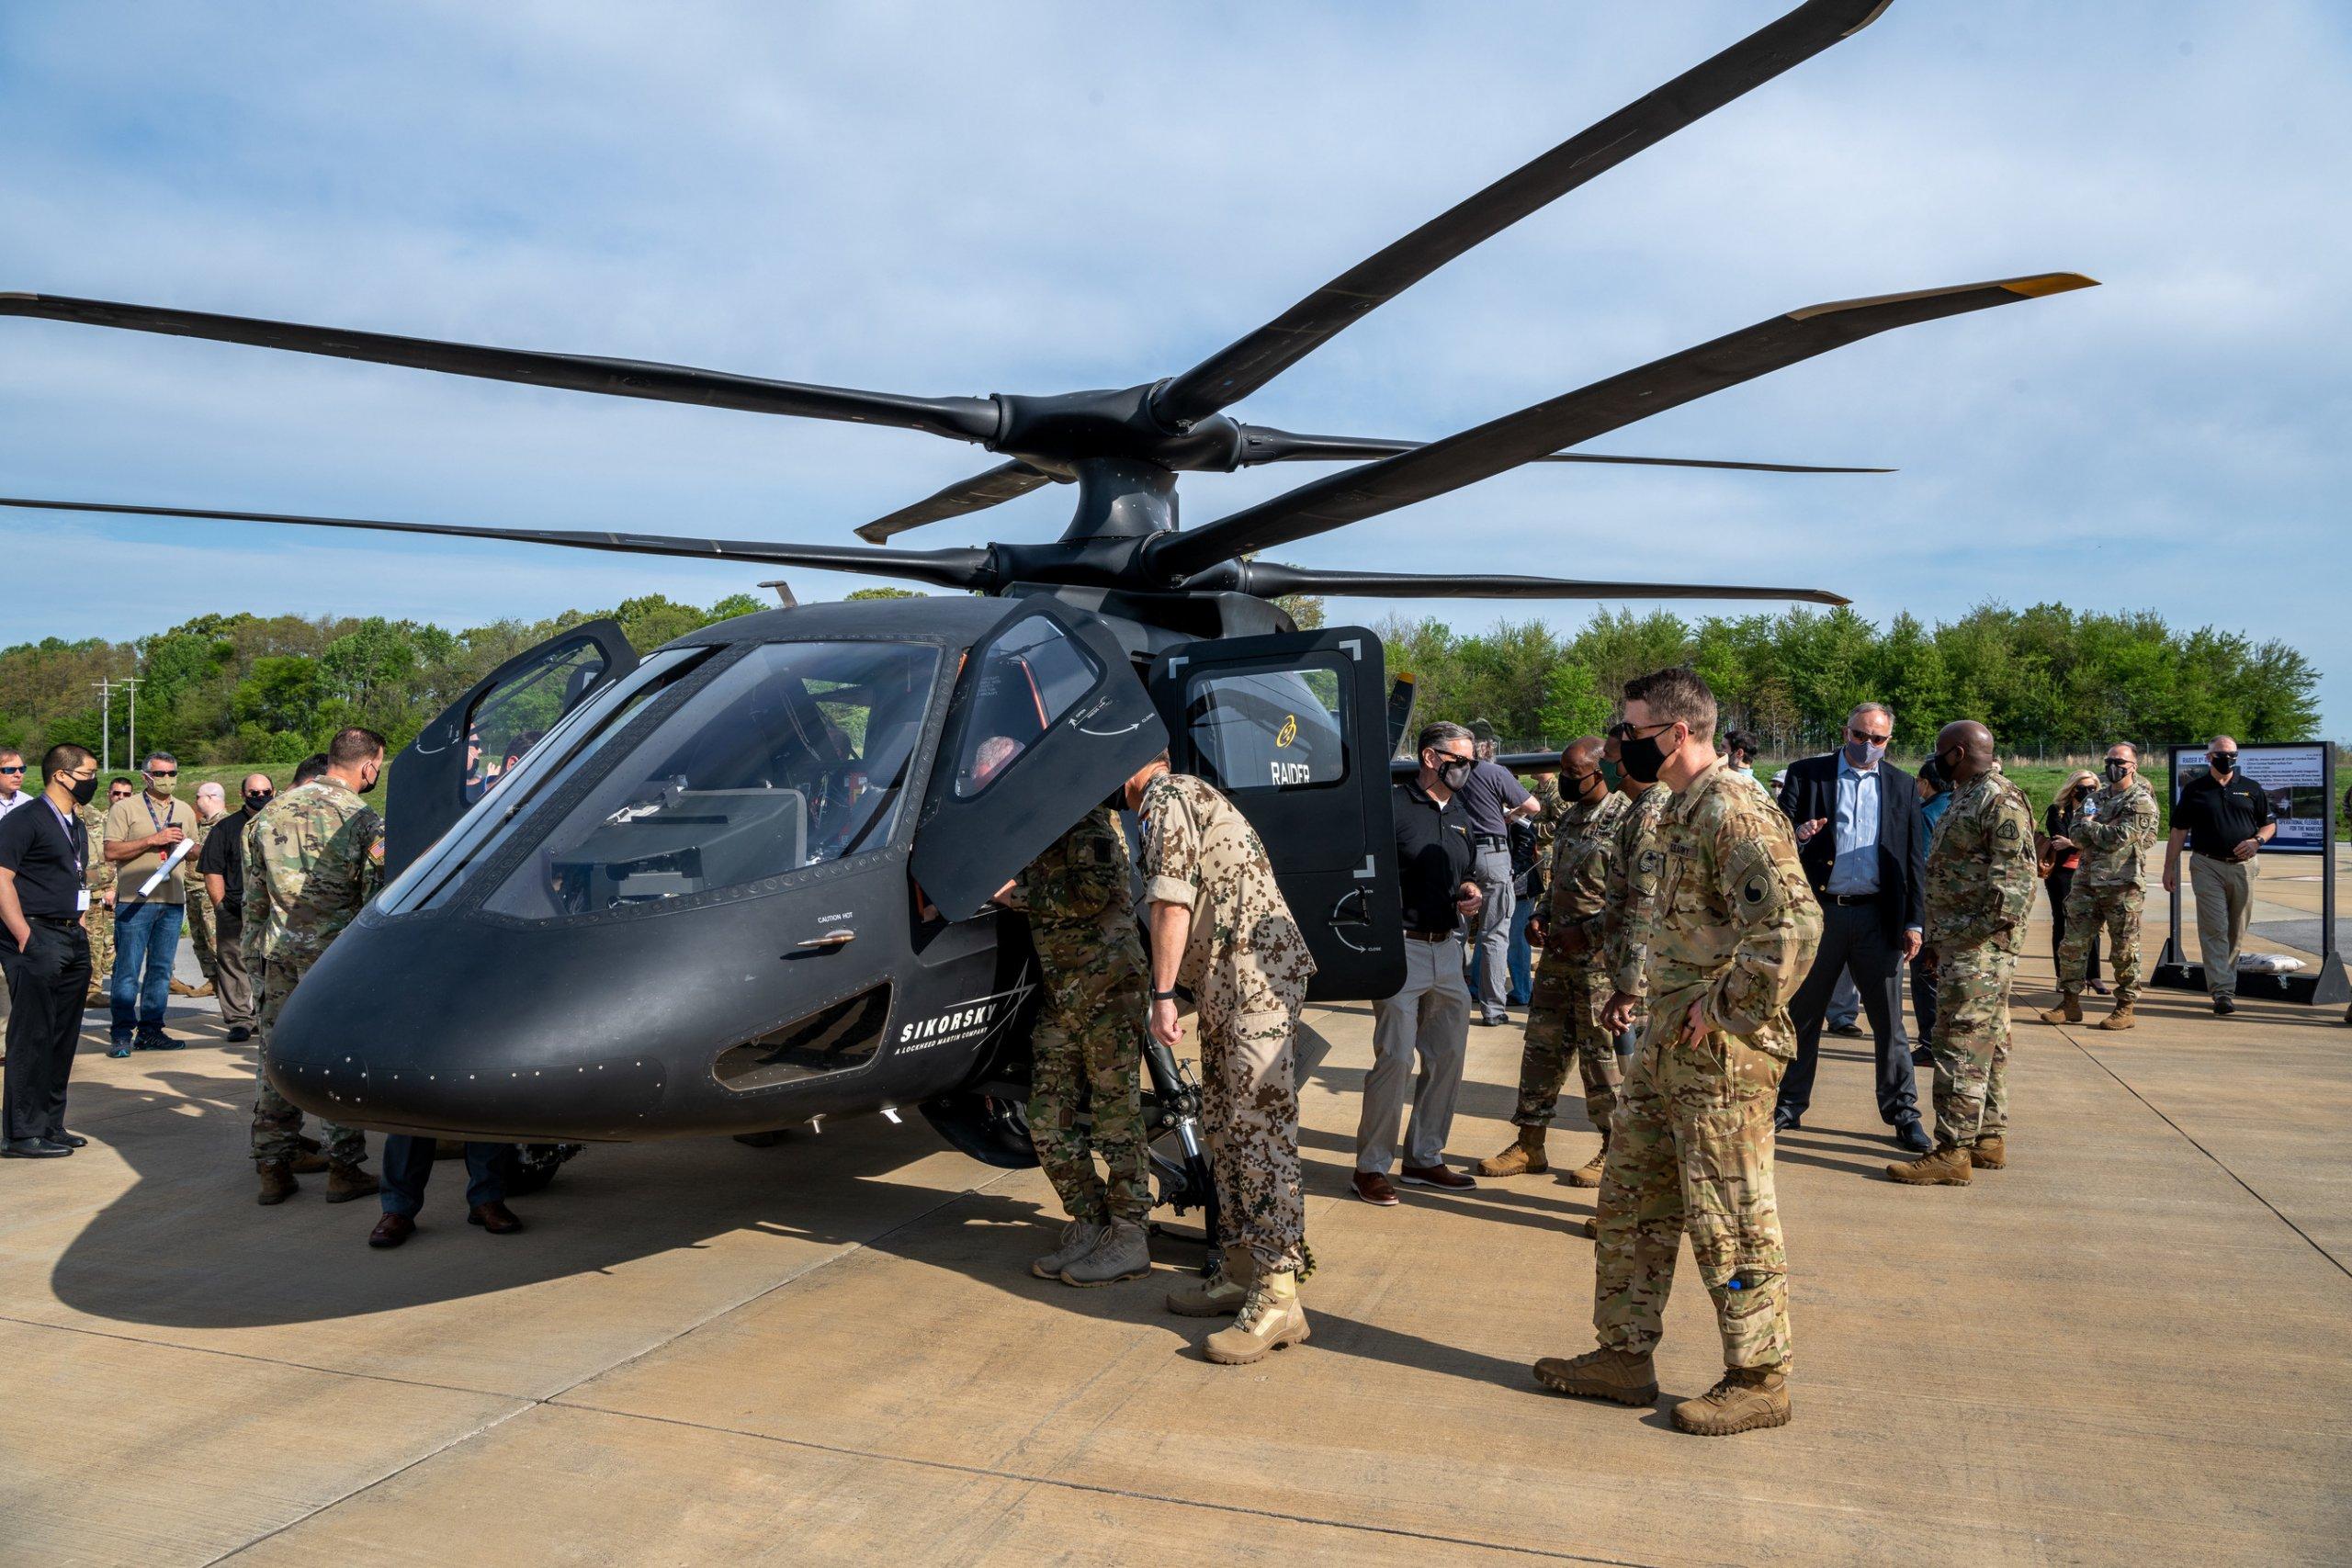 Sikorsky's S-97 Raider